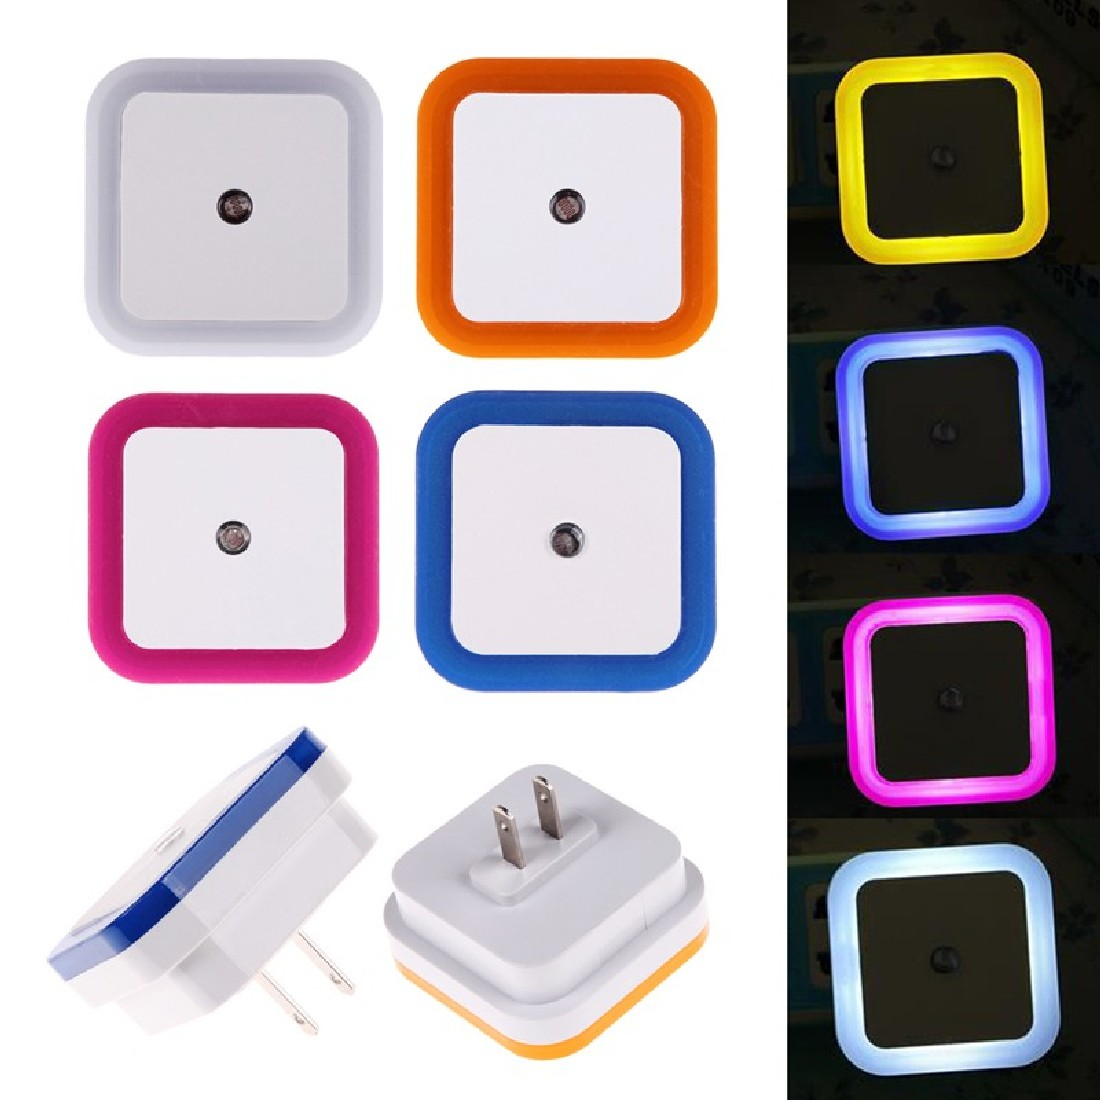 Bedroom Night Lights Bed Lamp Smart Lamp Household Lovely Square Auto LED Light Induction Sensor Control US Plug